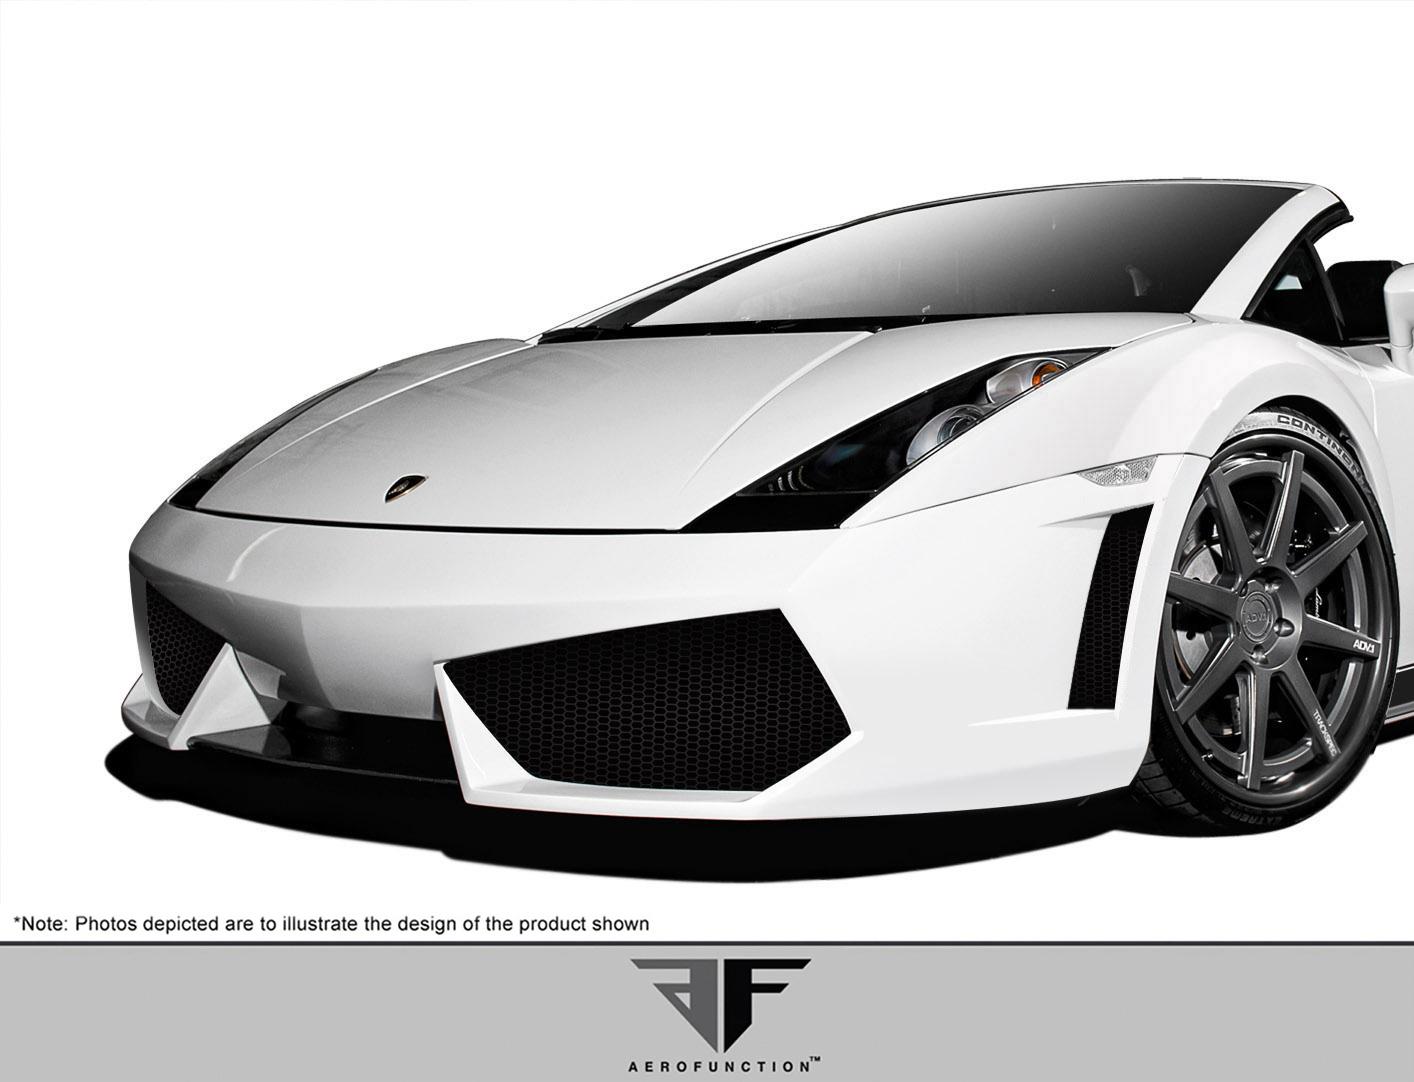 2004-2013 Lamborghini Gallardo Body Kit